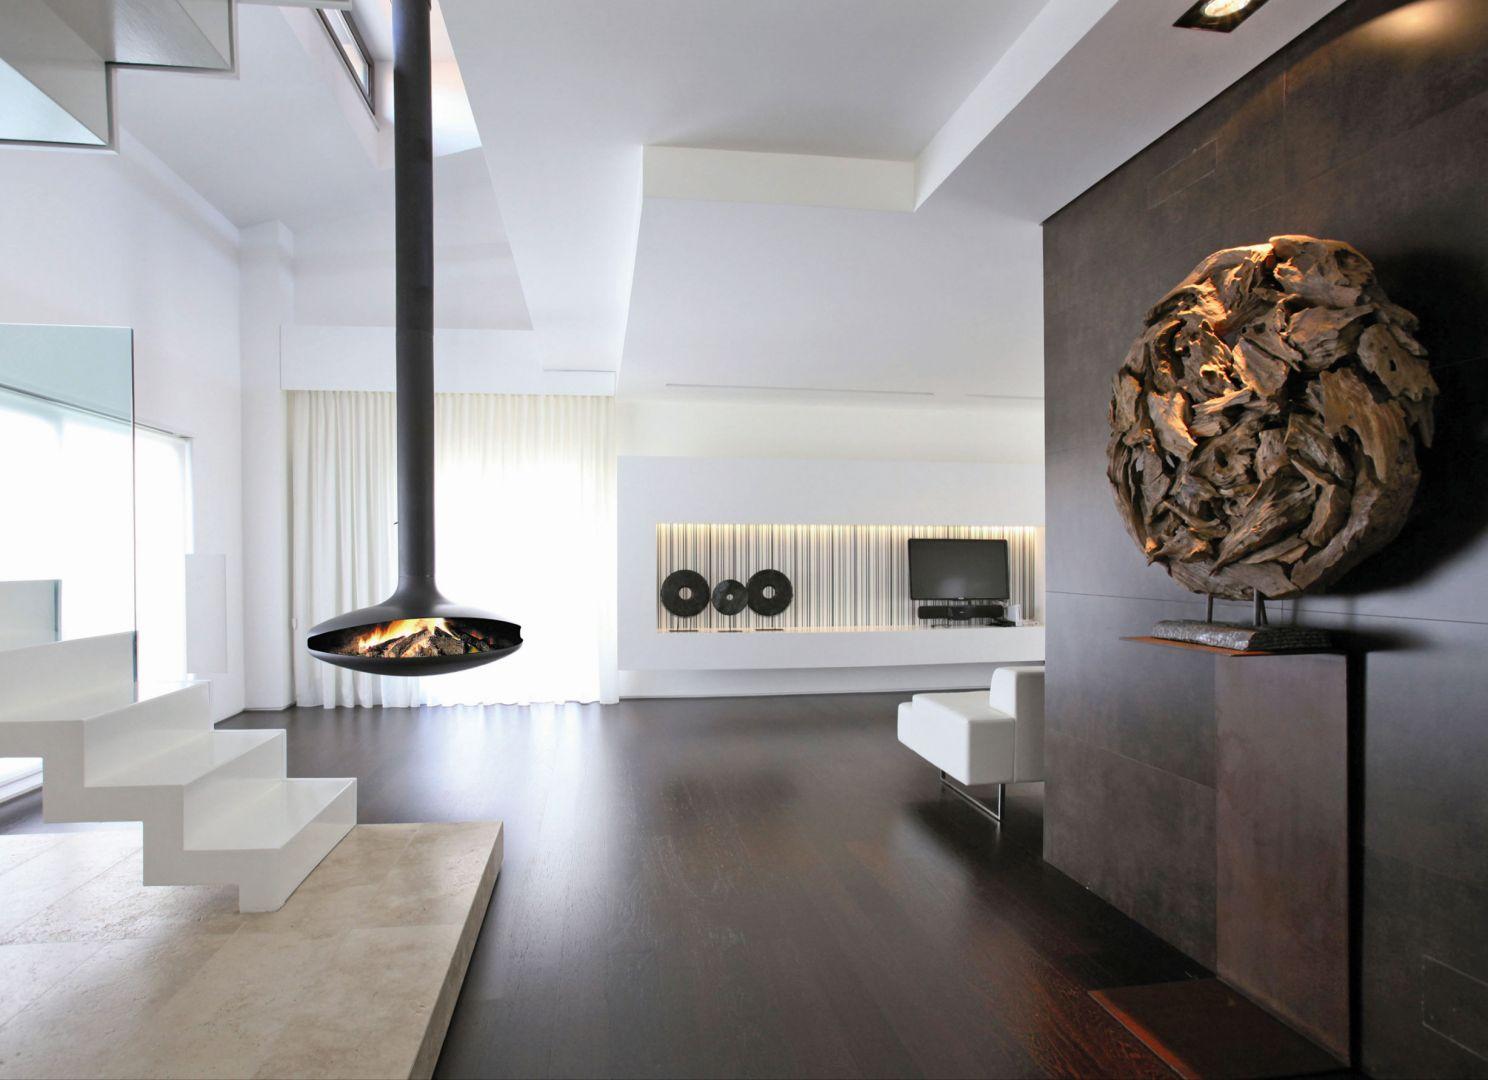 installateurs et distributeurs de po les cheminee design moderne. Black Bedroom Furniture Sets. Home Design Ideas